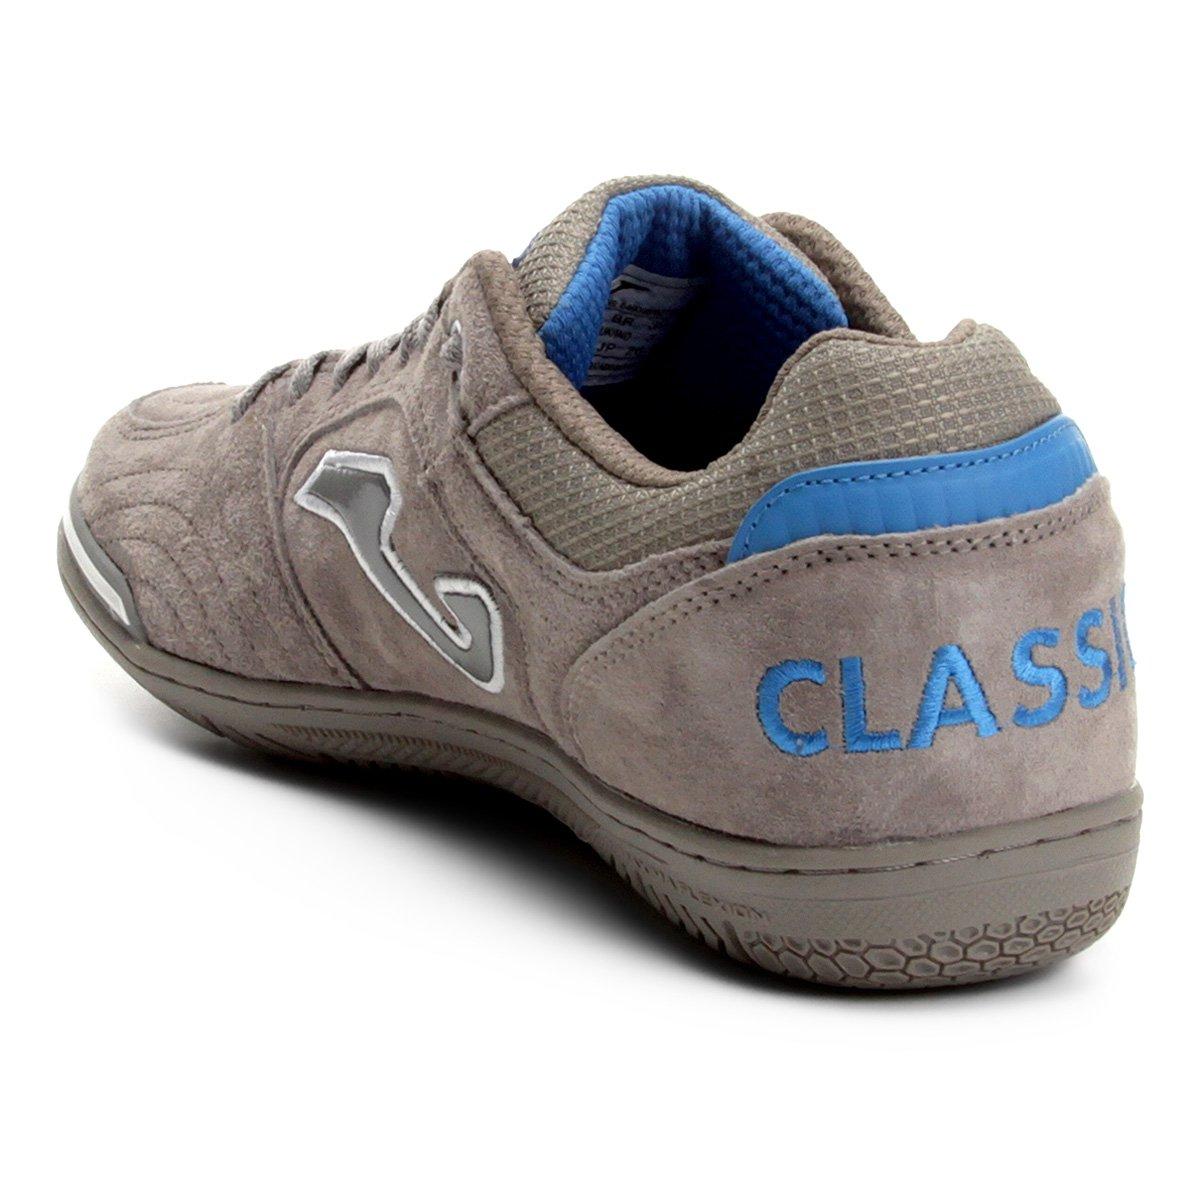 Chuteira Futsal Joma Classic Nobuck IN - Cinza - Compre Agora  1ef2826bb9df7